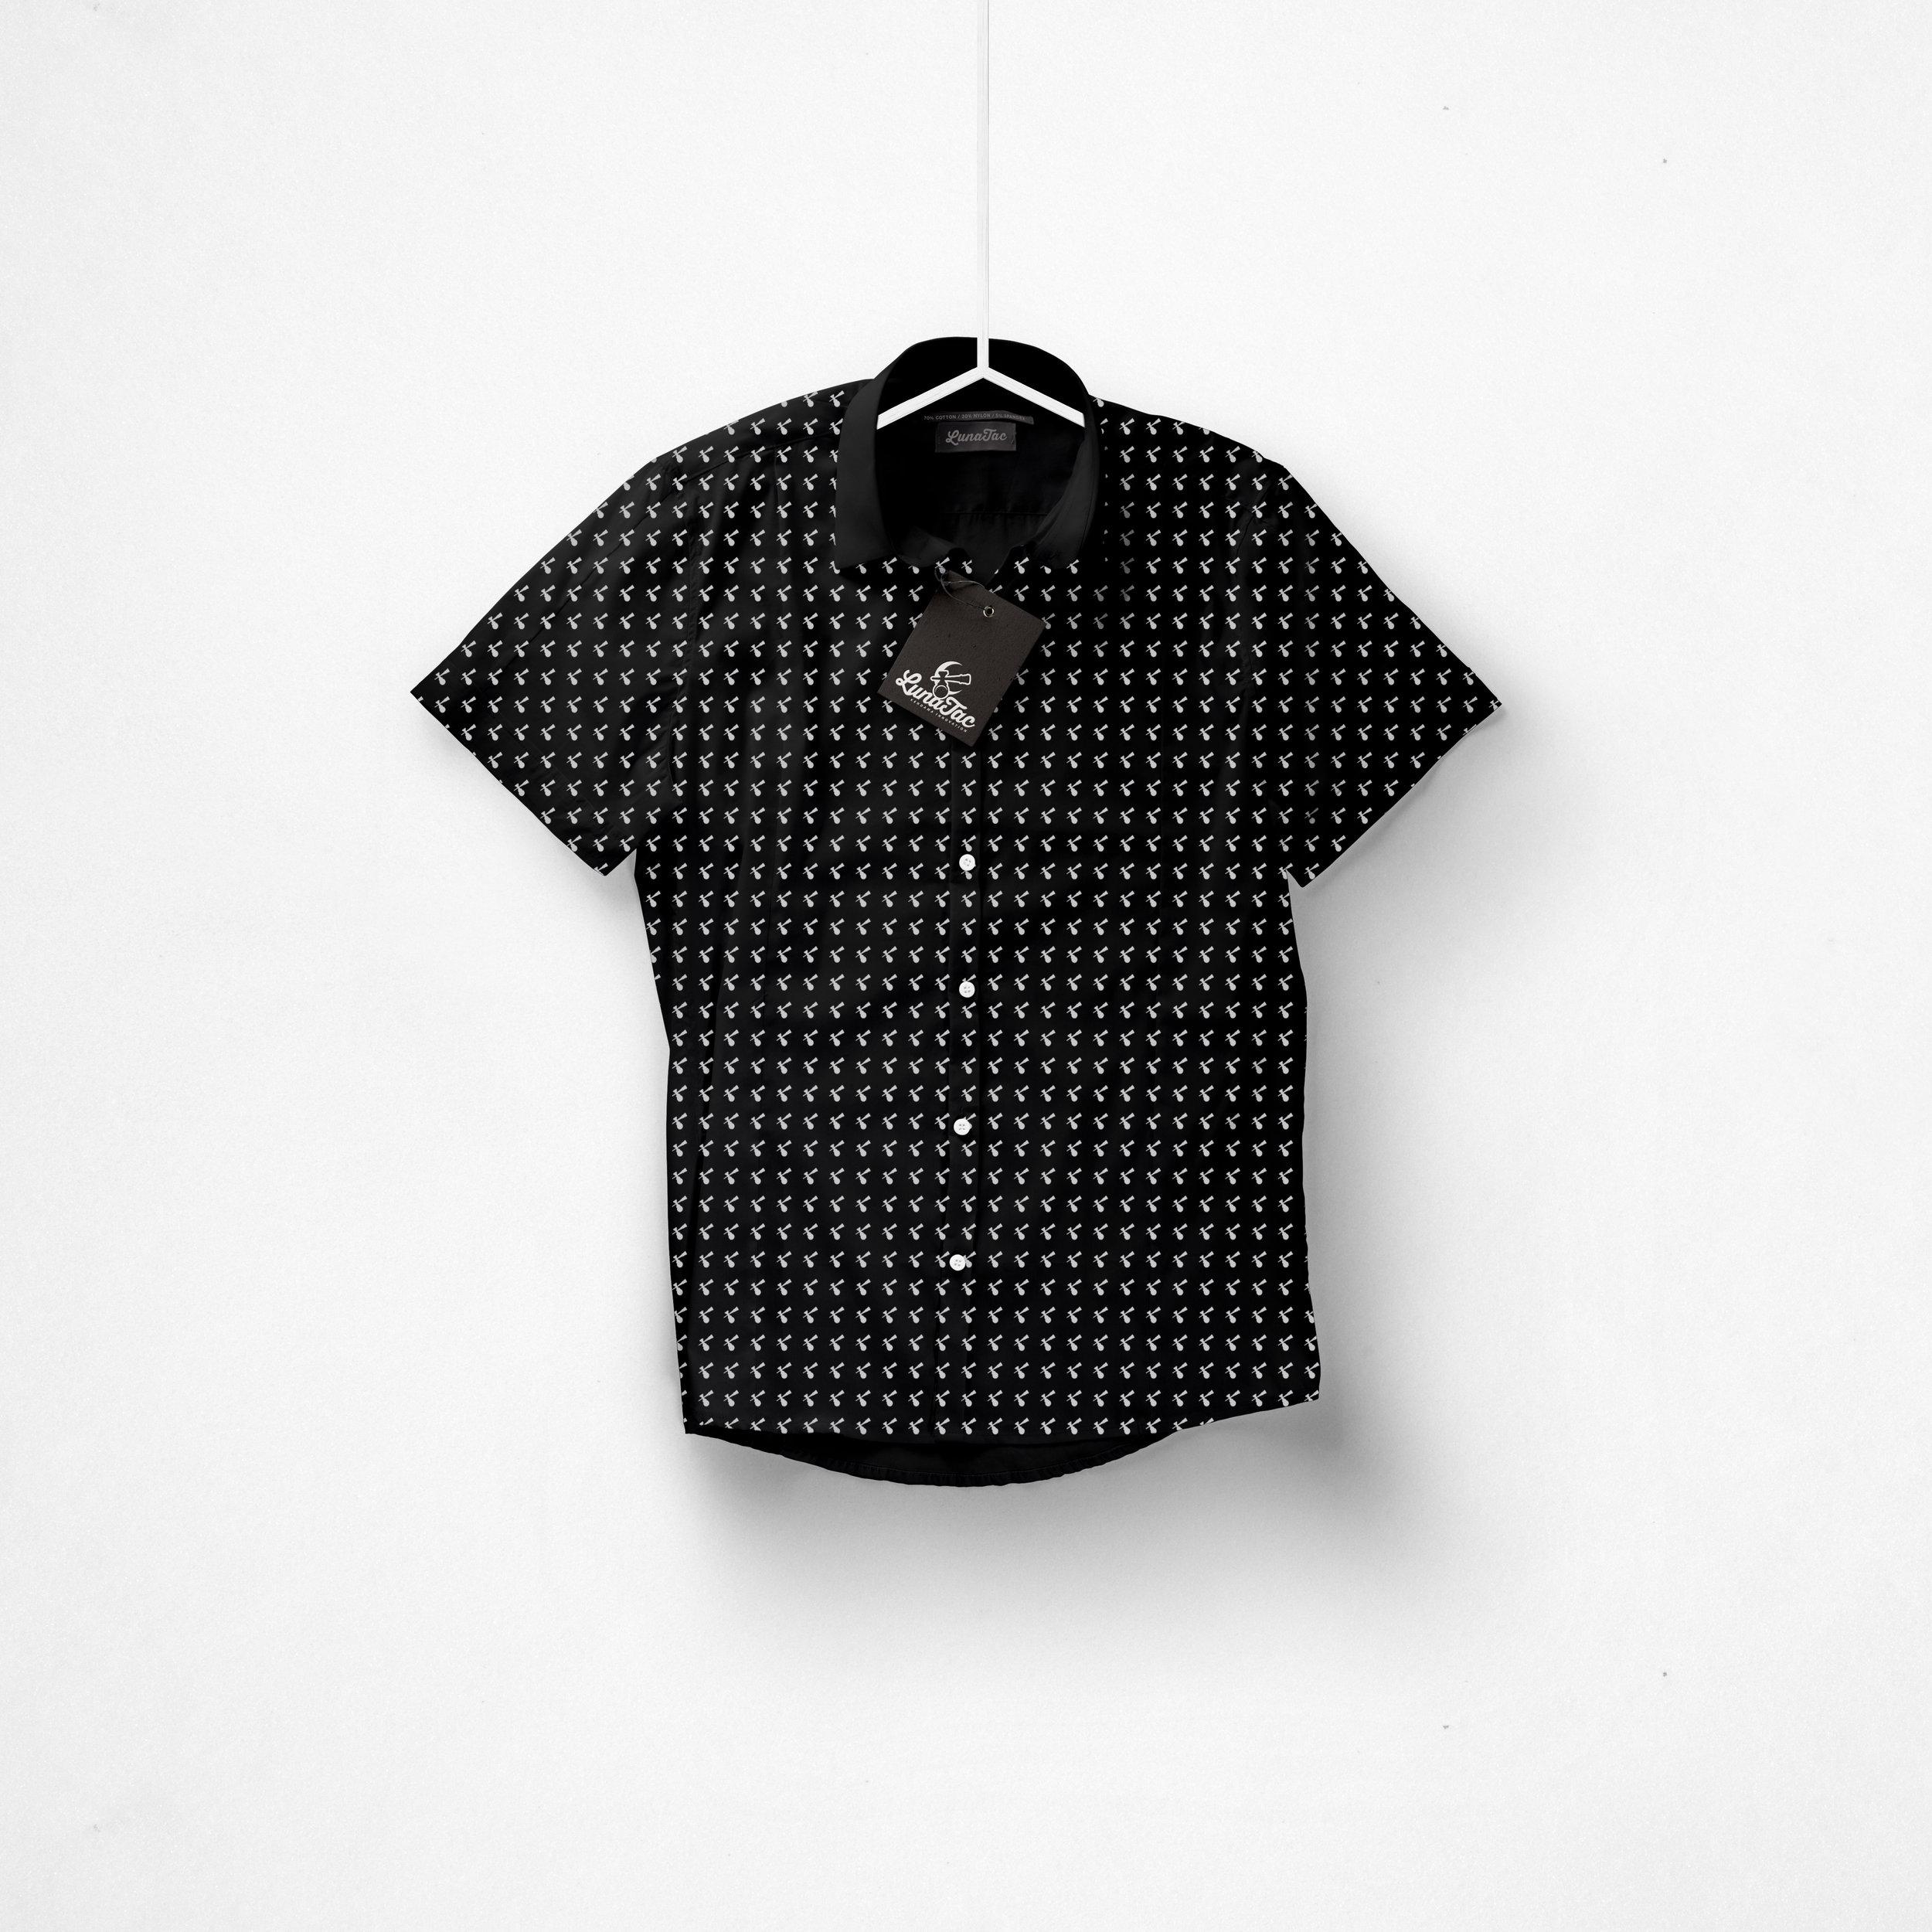 kendama-button-up-short-sleeve-all-over-print-shirt